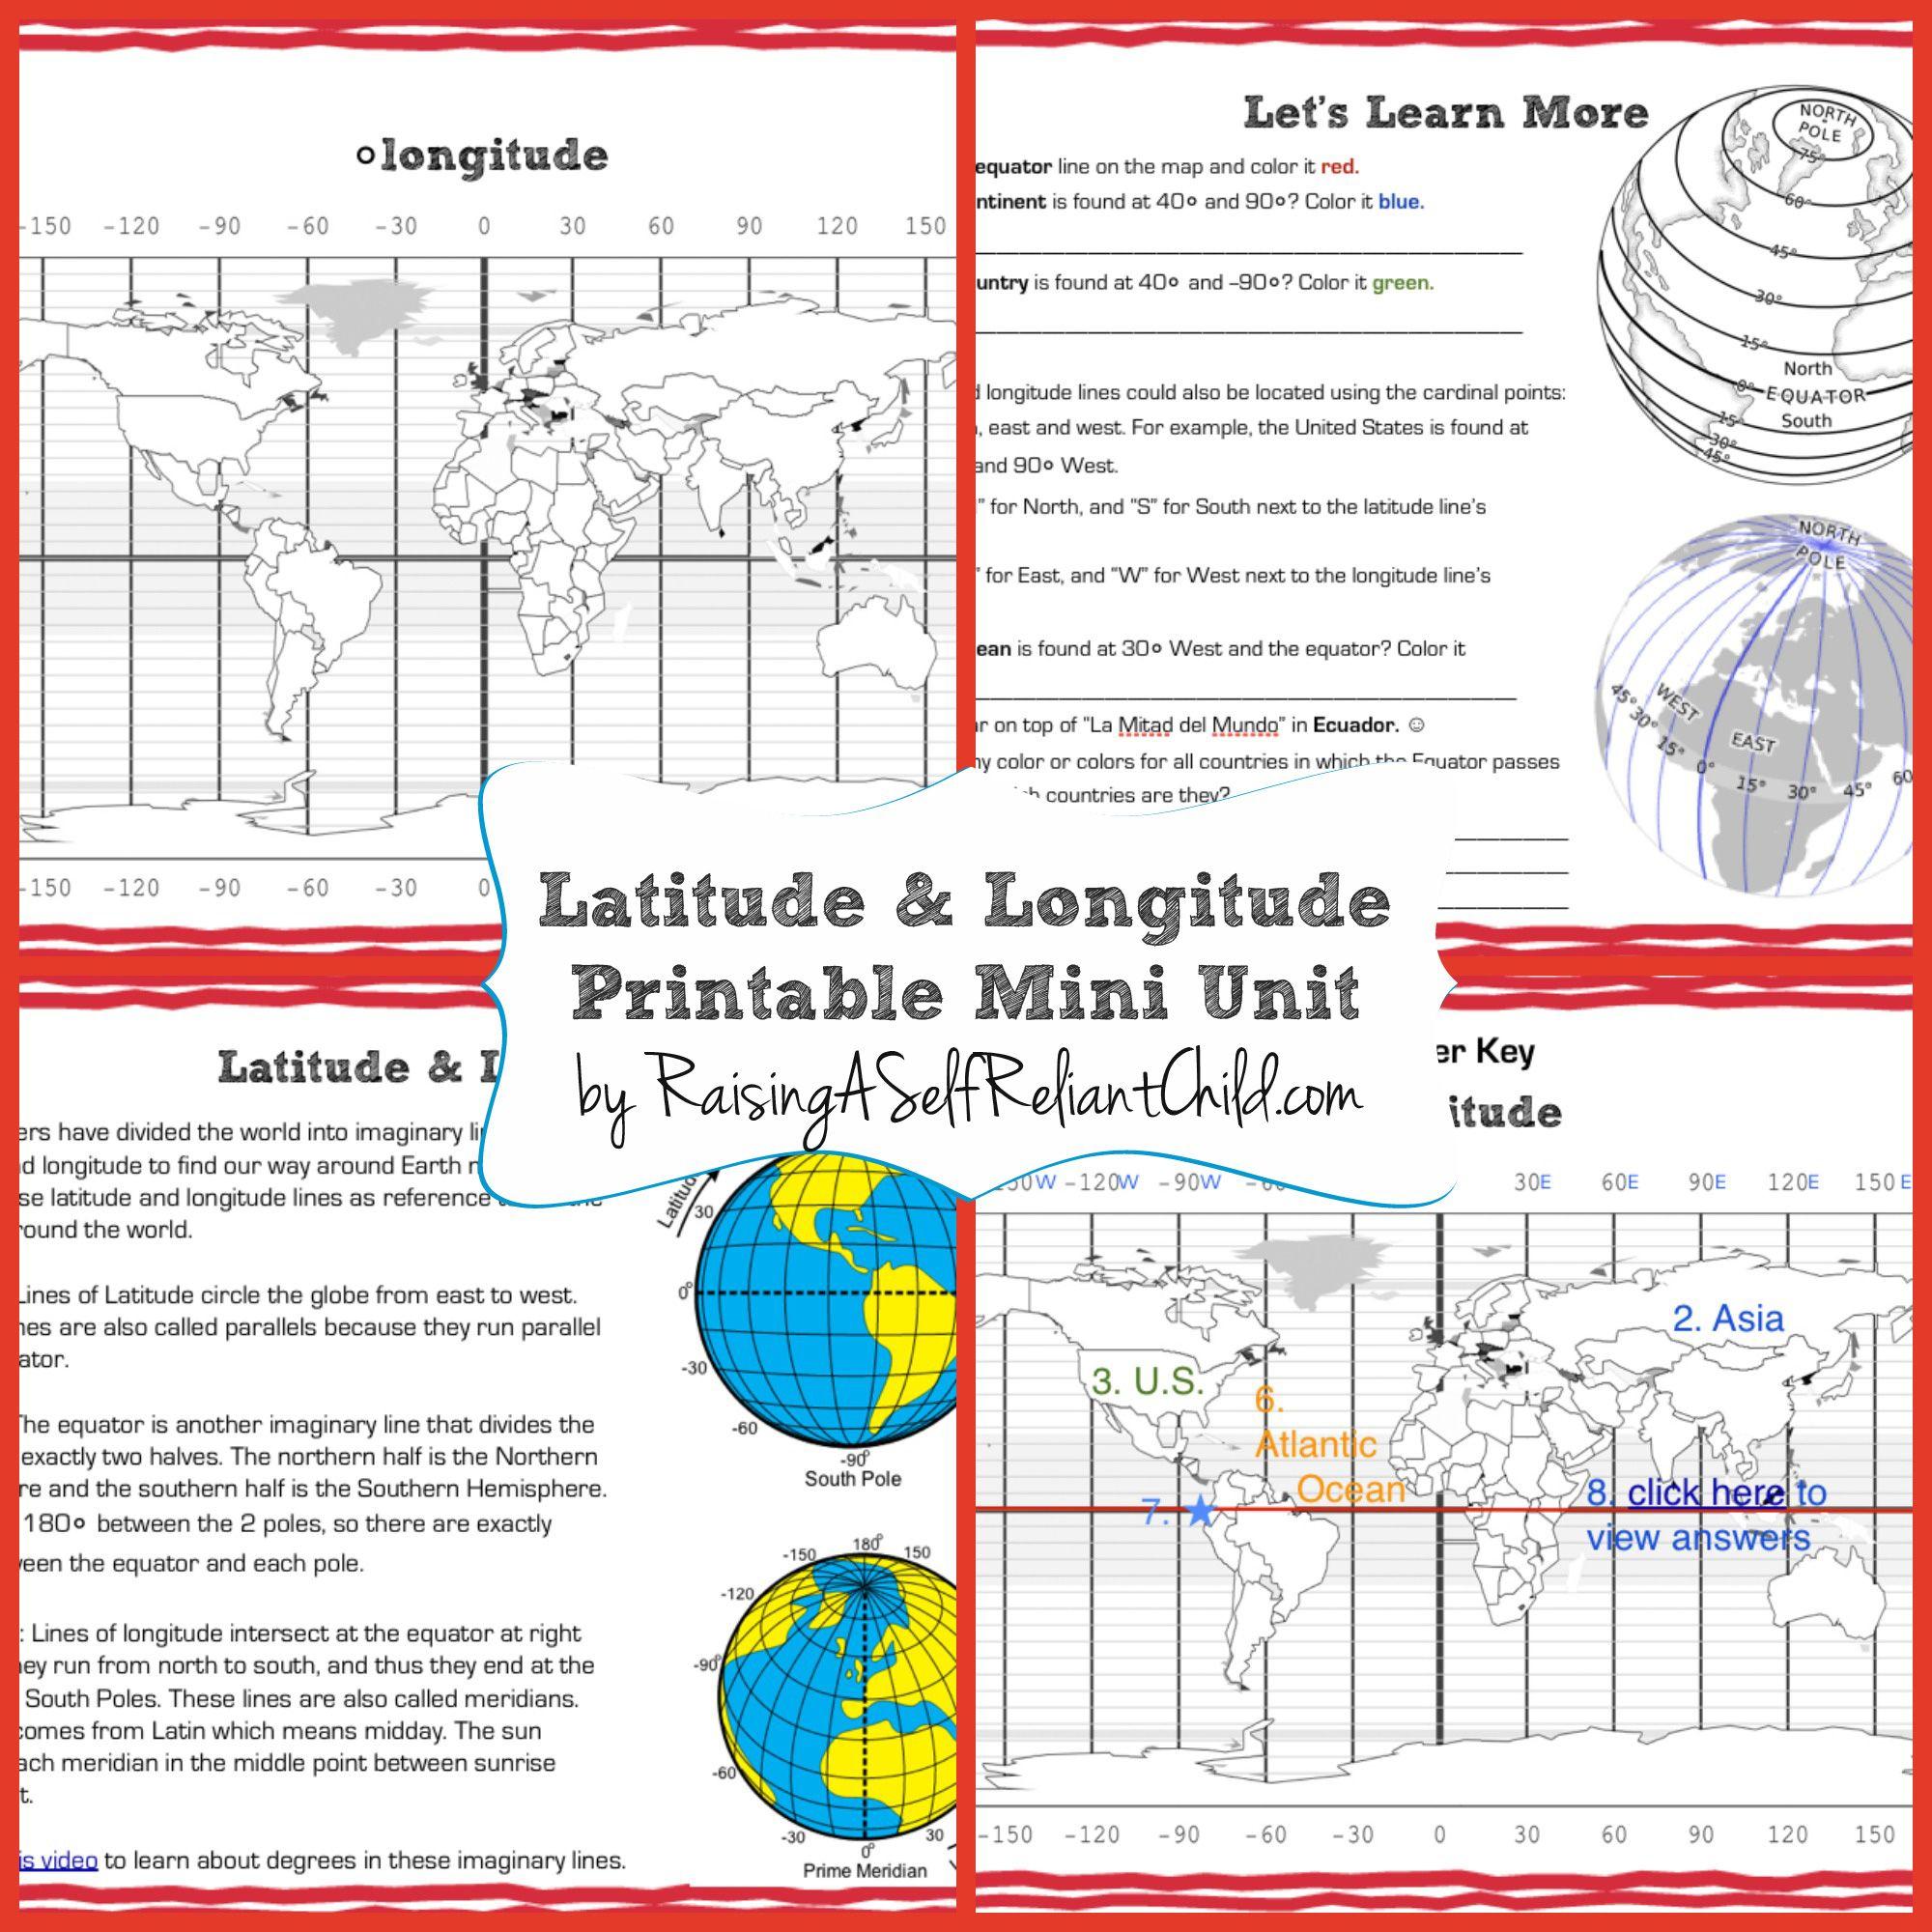 Free Printable Mini Unit Latitude And Longitude For Kids | The | Latitude And Longitude Worksheets Free Printable